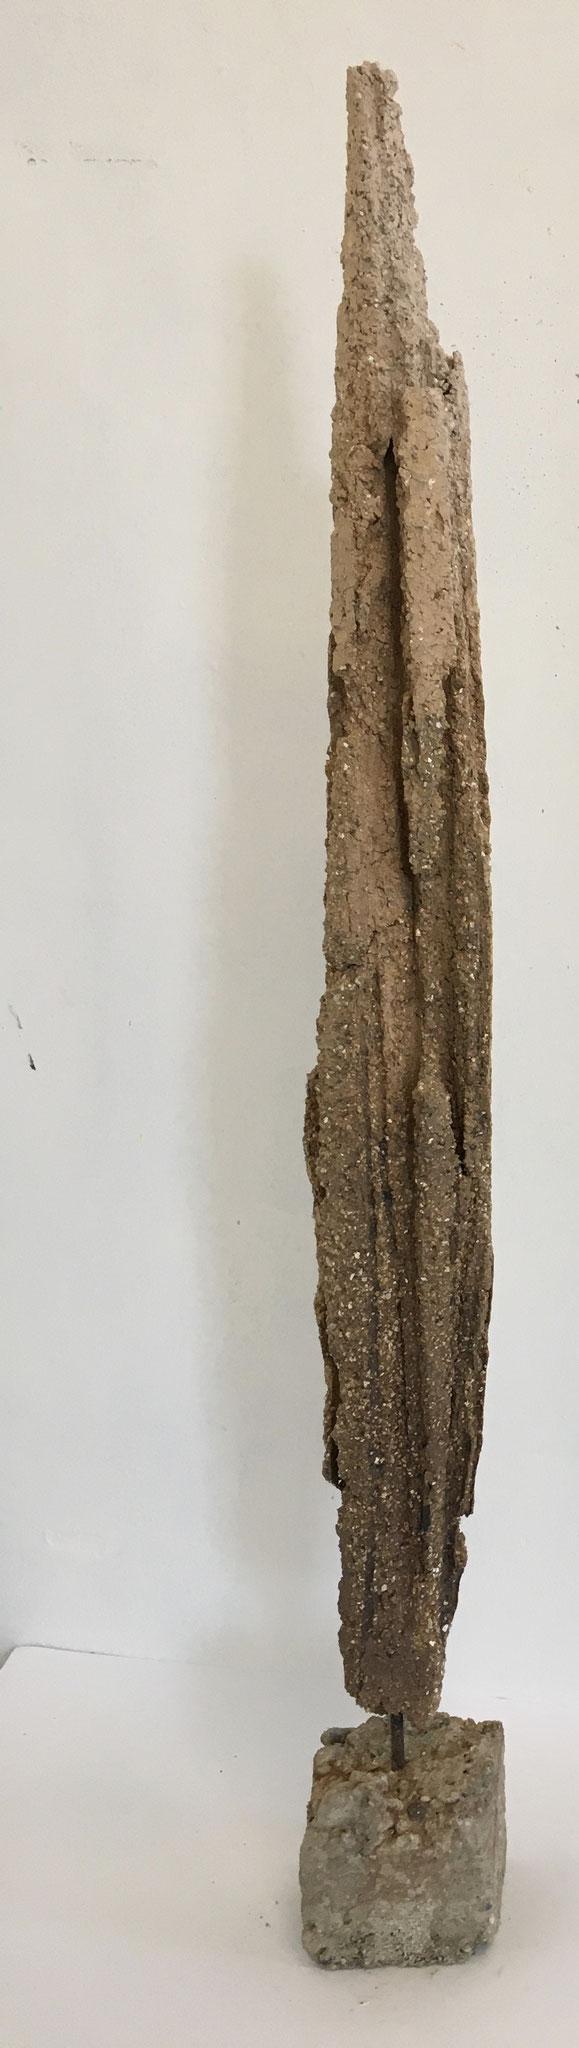 Grès sauvage 1 - 86 cm